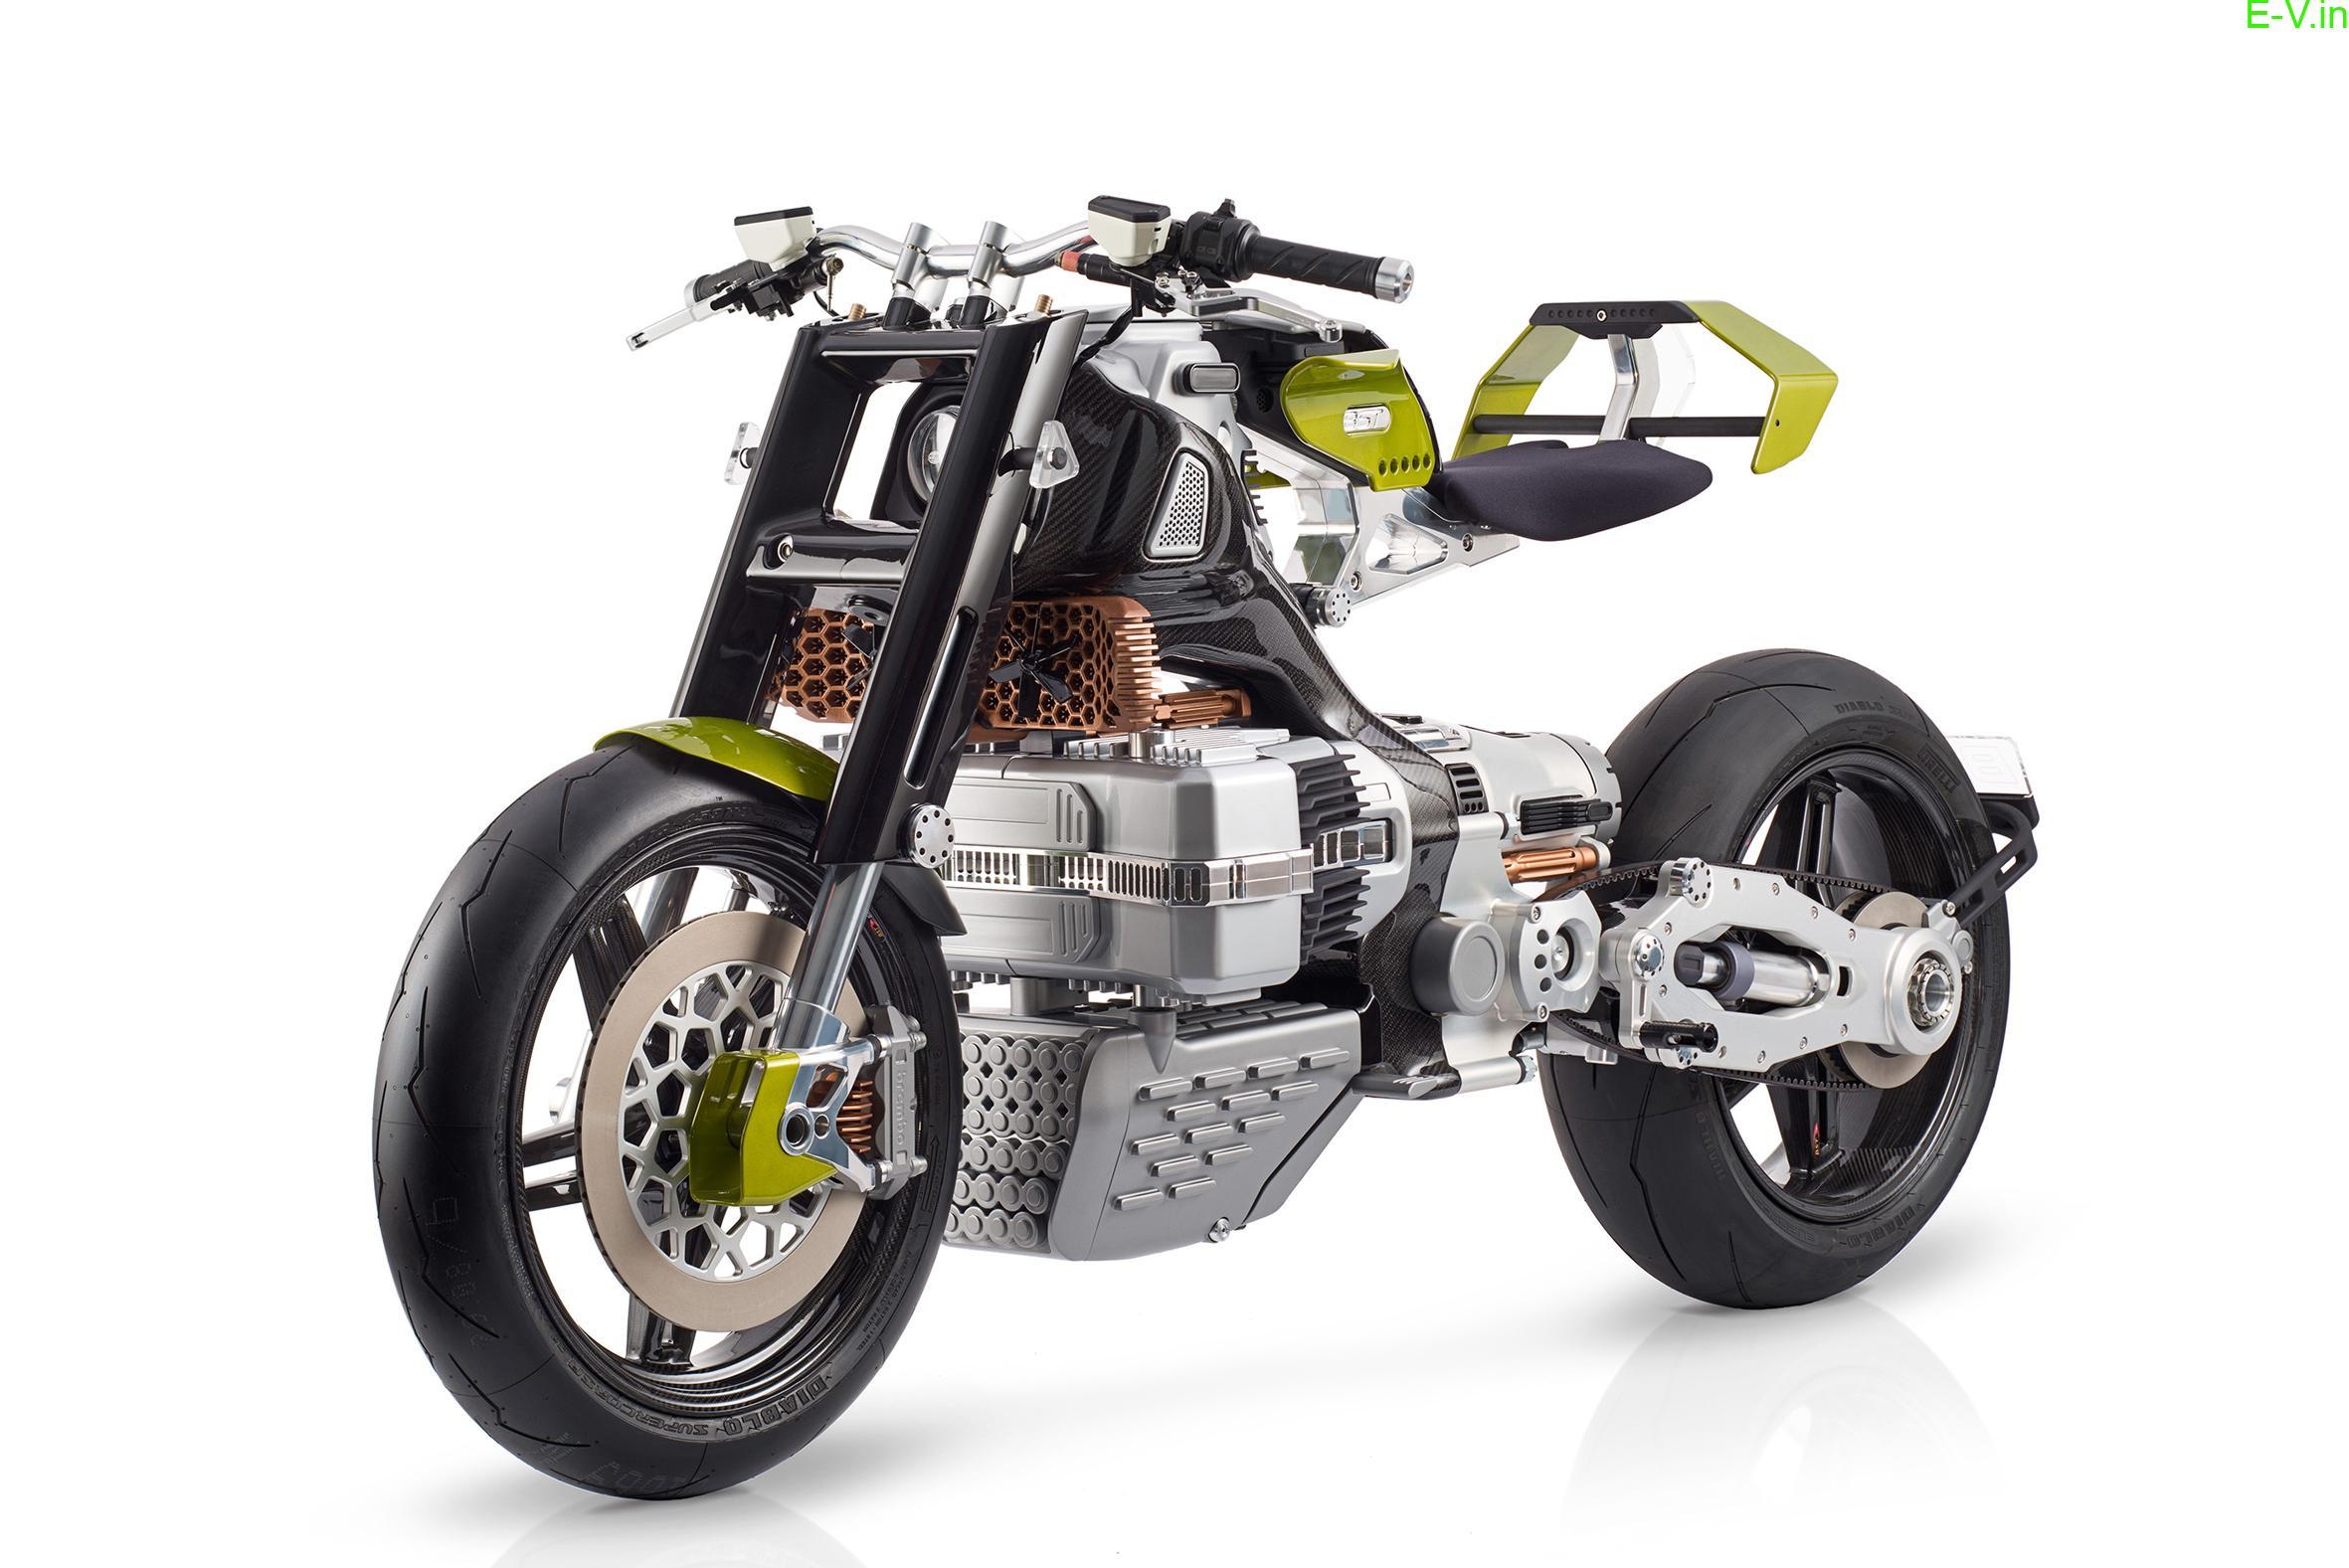 BST Hypertek electric bike